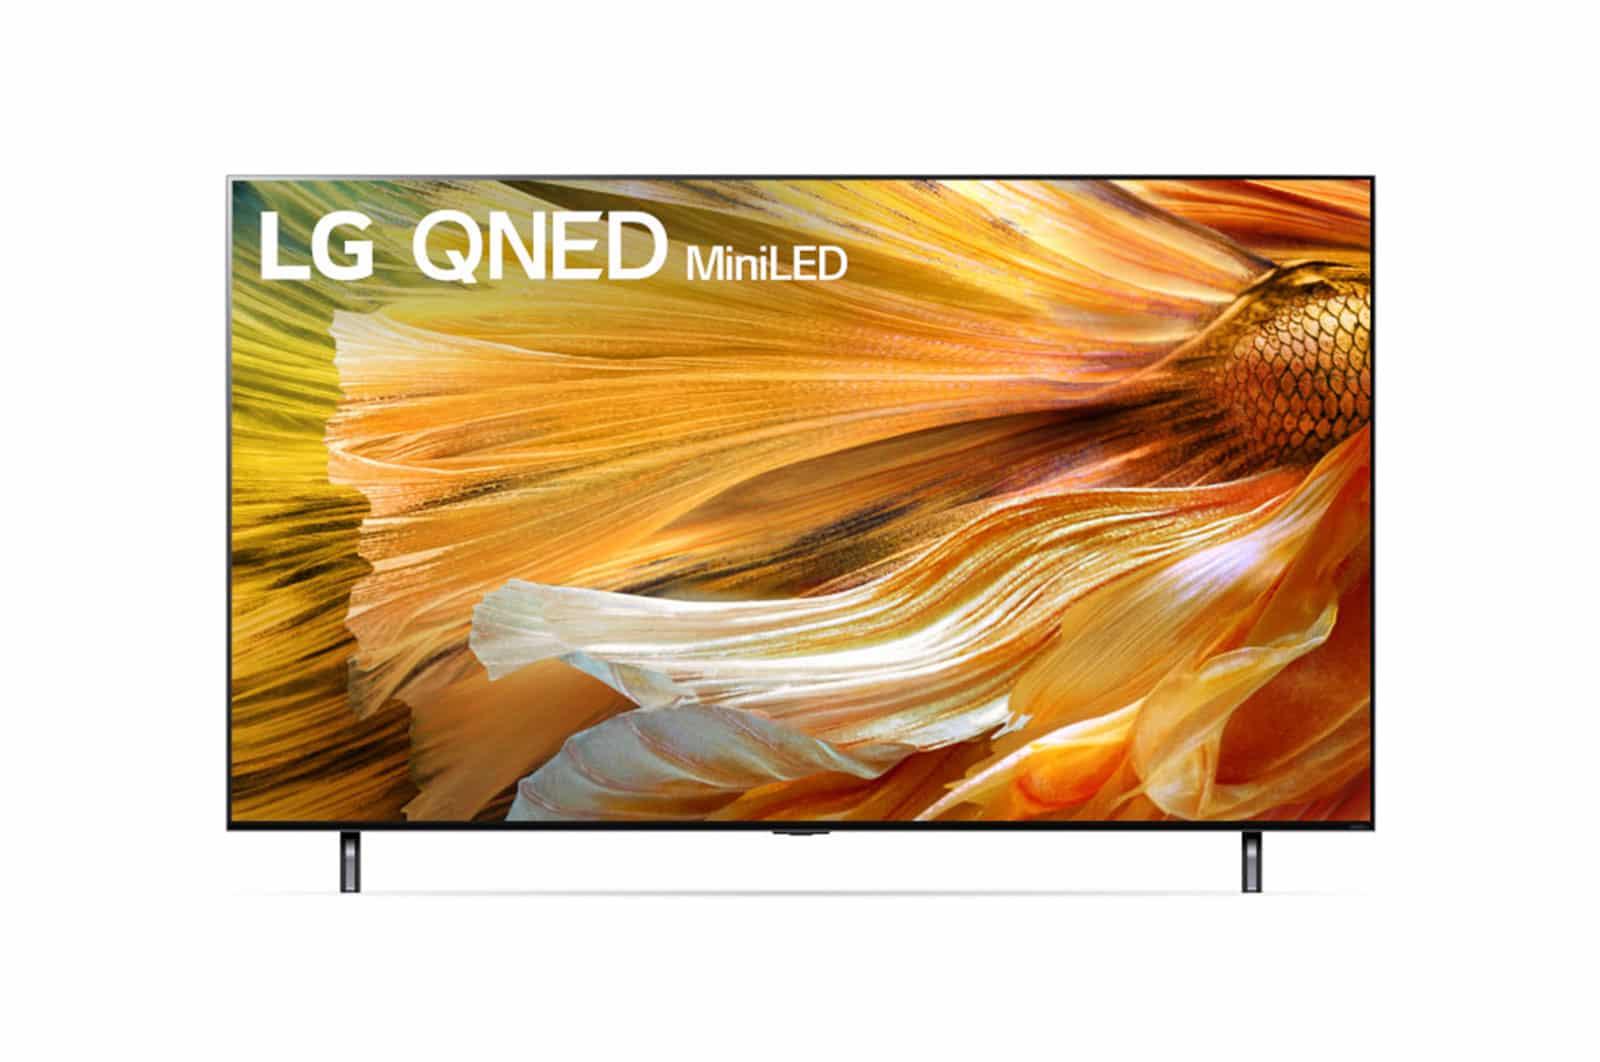 LG Mini DEL QNED90 4K Téléviseur Intelligent de 65 po (65QNED90UPA)